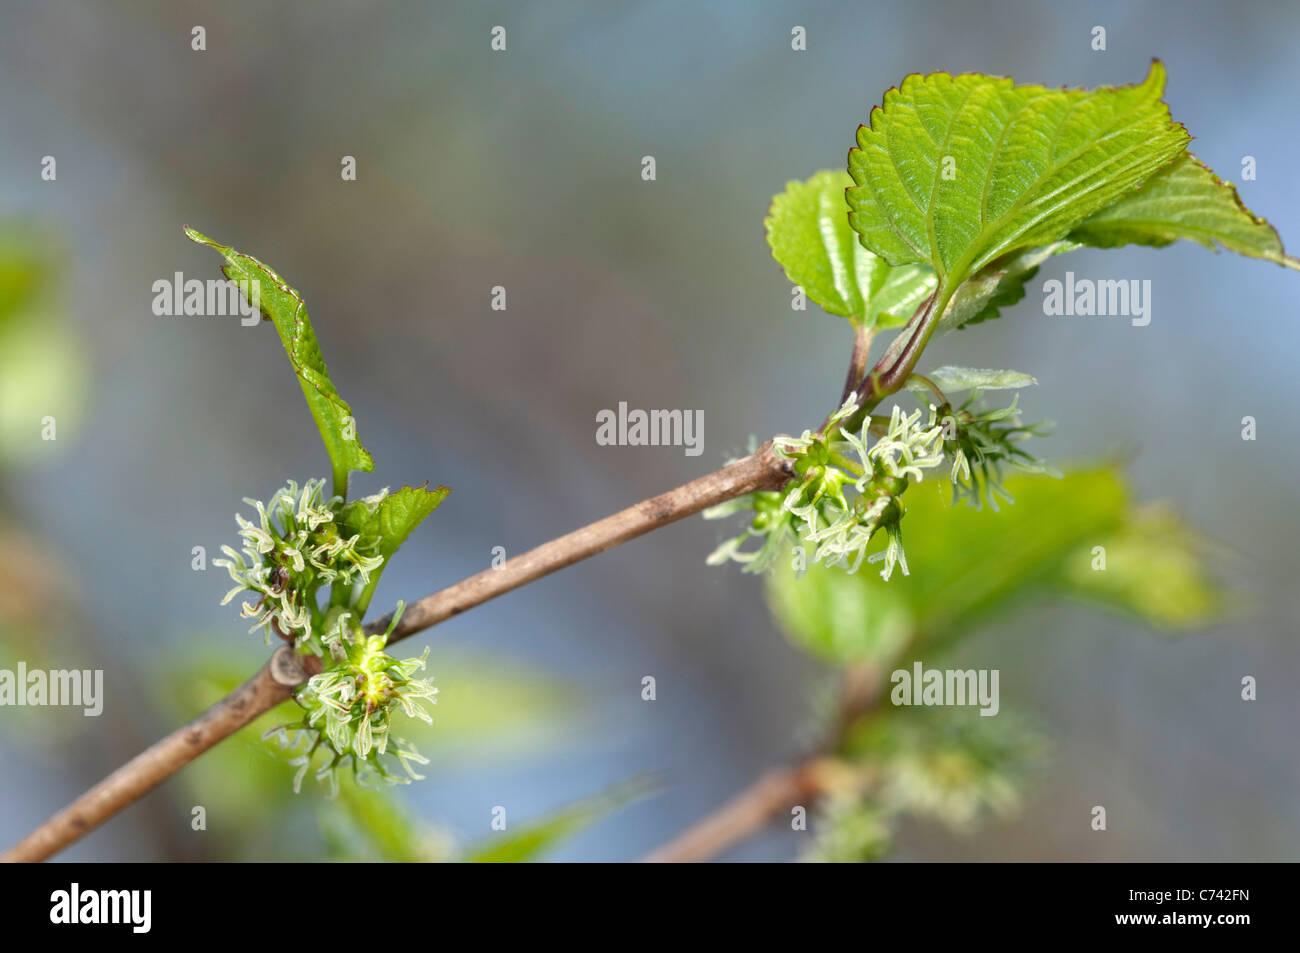 Chinese Mulberry (Morus bombycis Yamaguwa). Flowering twig. - Stock Image